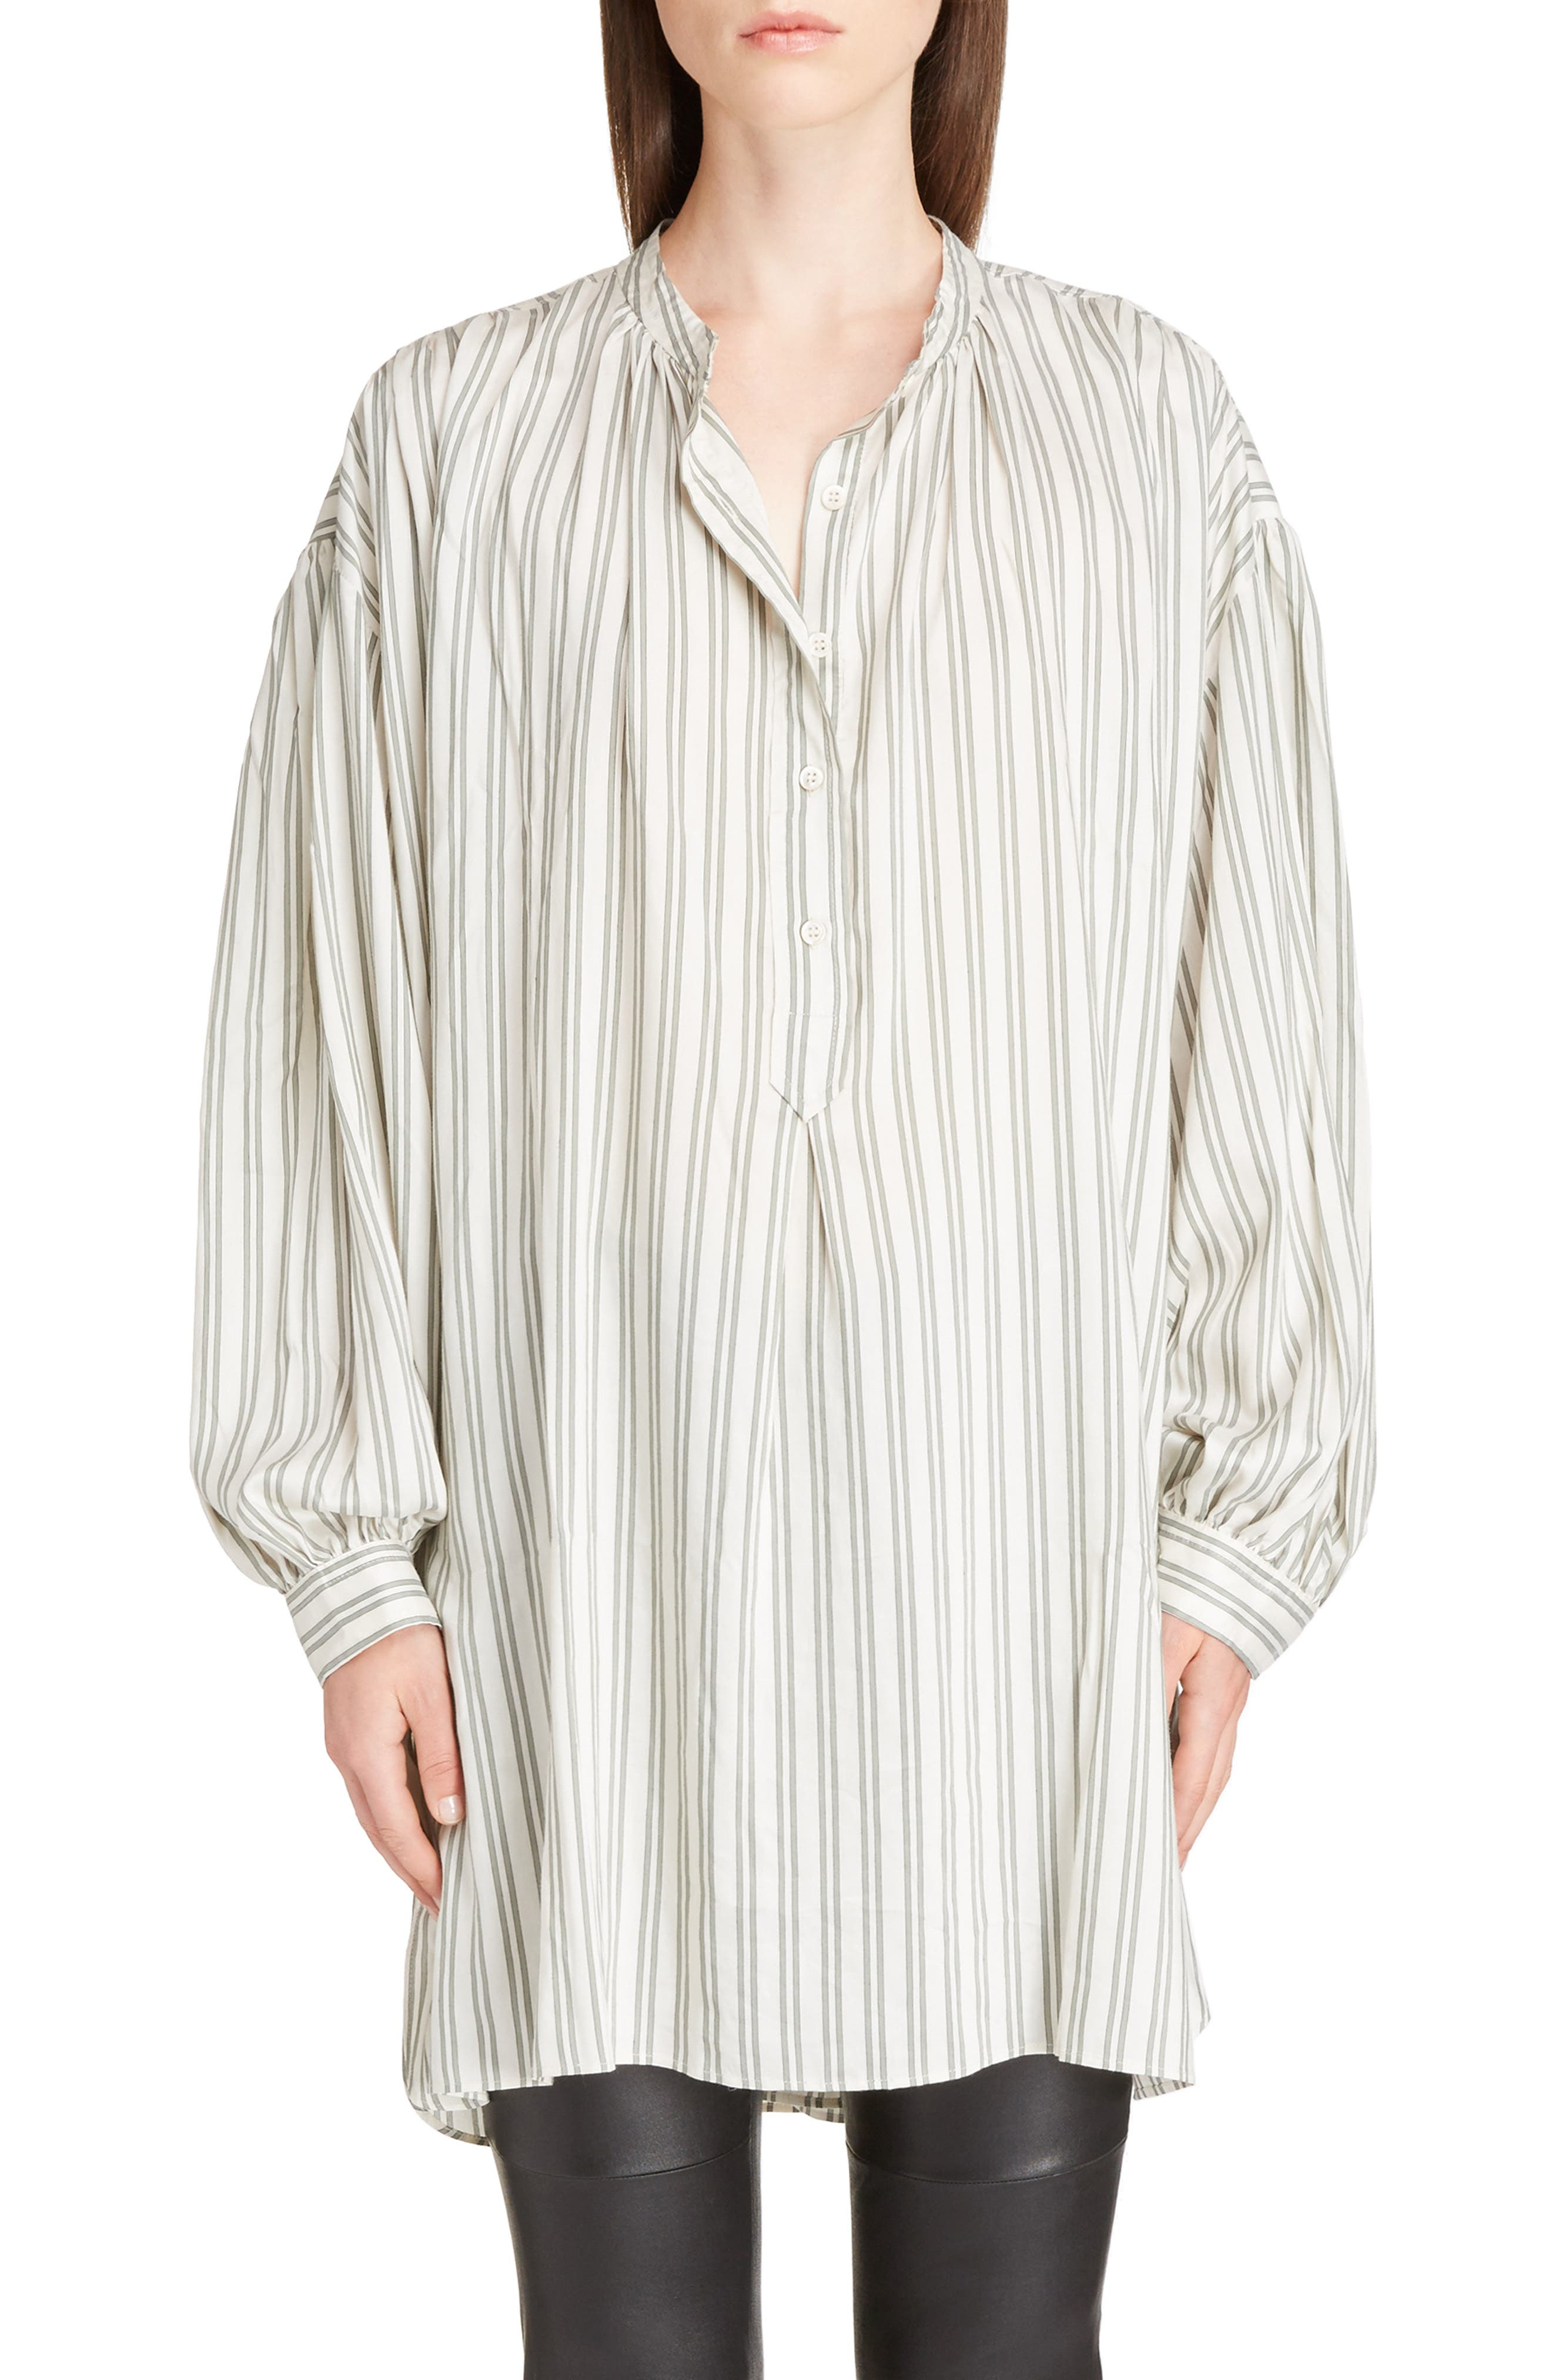 Idoa Stripe Tunic,                             Main thumbnail 1, color,